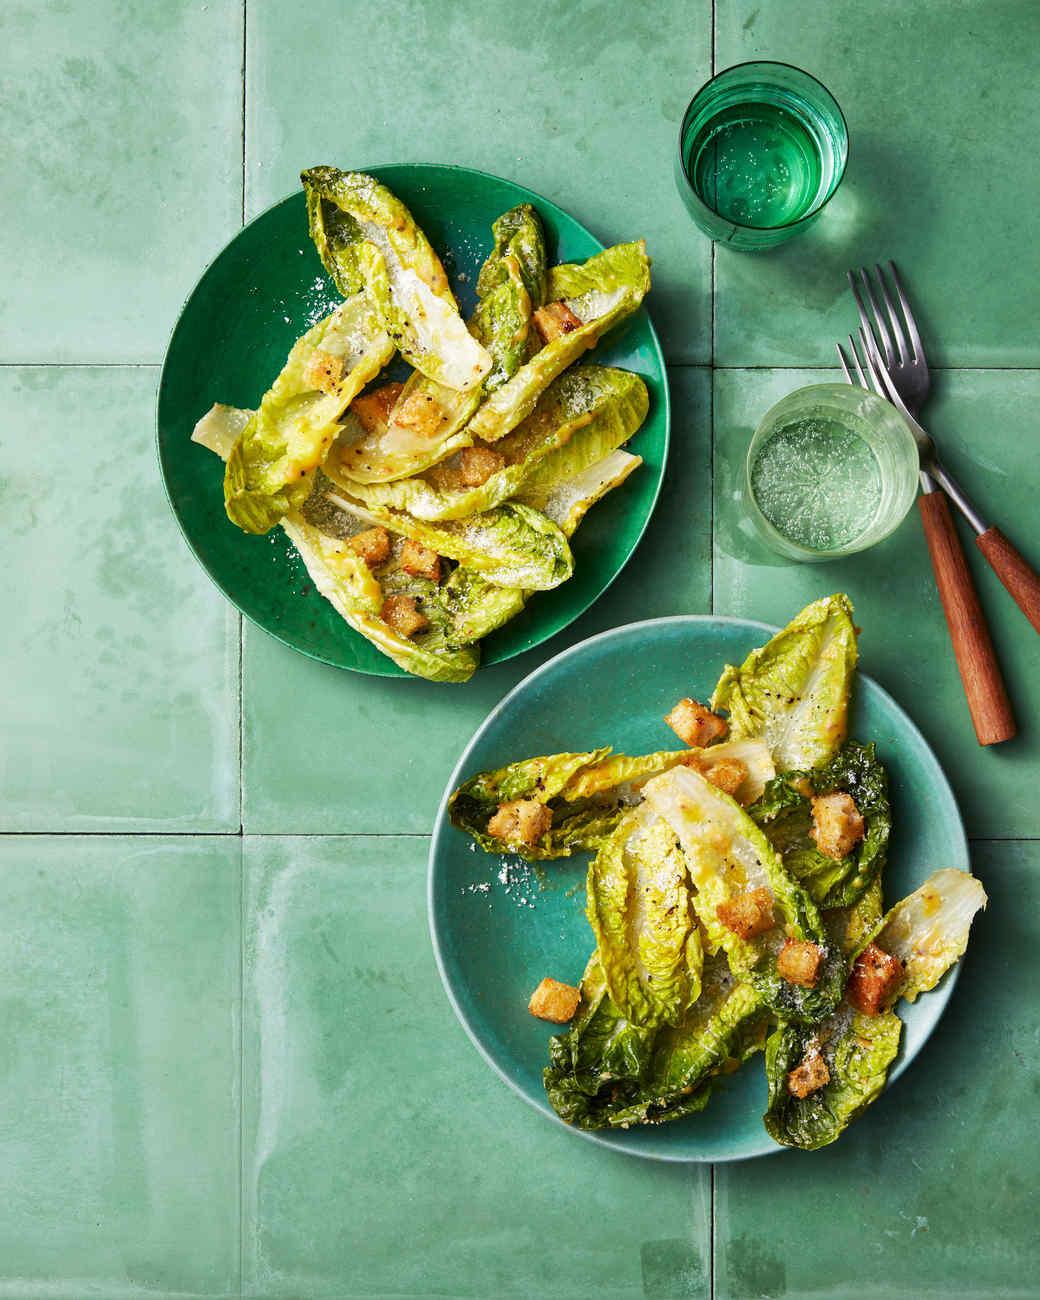 caesar-salad-plated-382-d113096-1.jpg